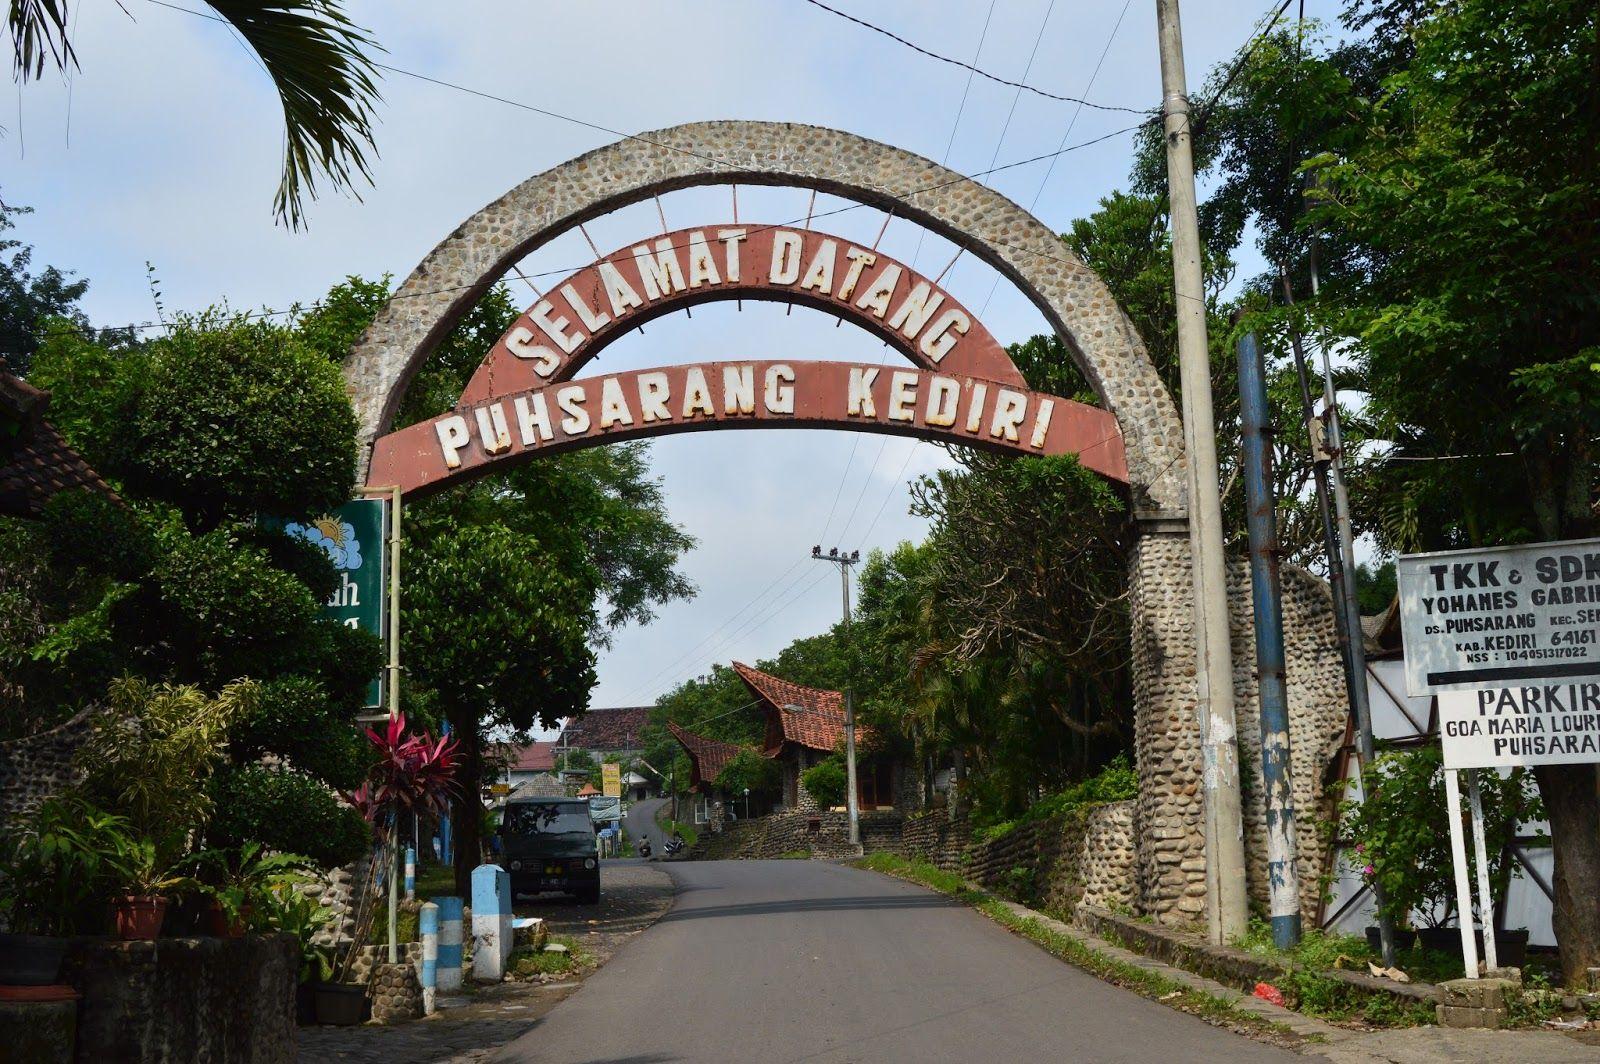 Gereja Pohsarang Gua Maria Lourdes Kediri Jawa Timur Steemit Lokasi